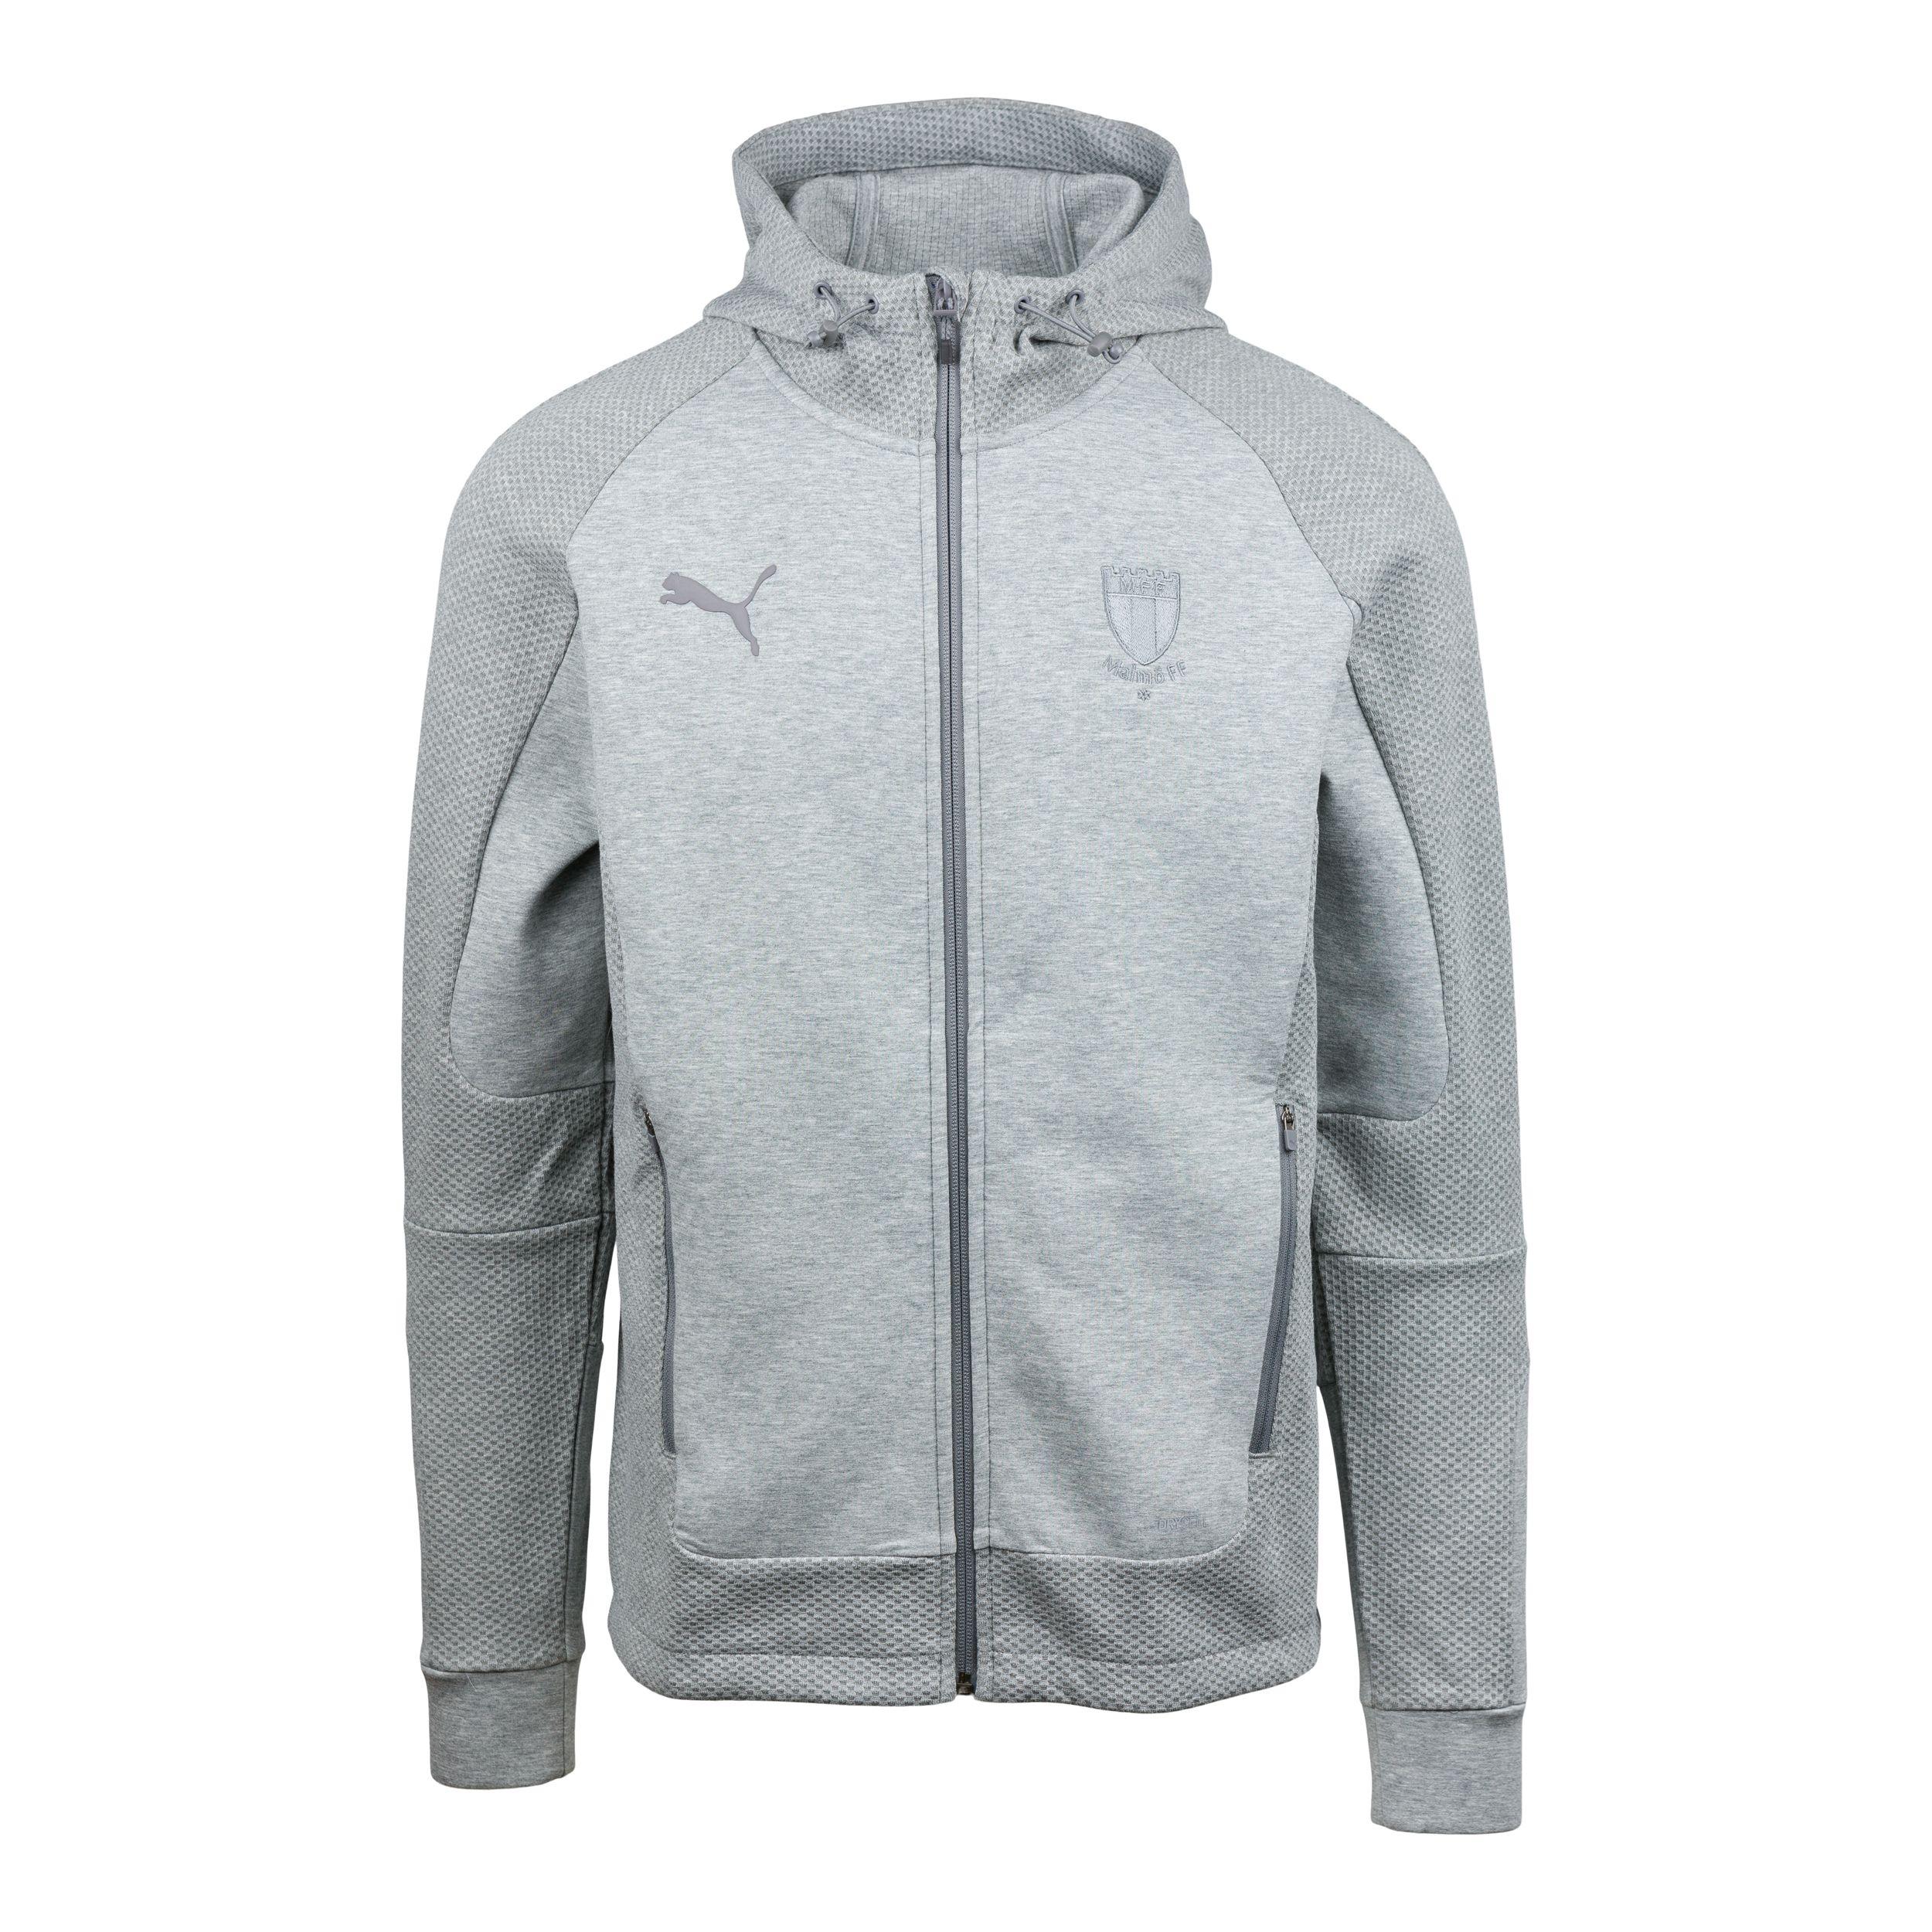 Puma teamcup ziphood grå logo